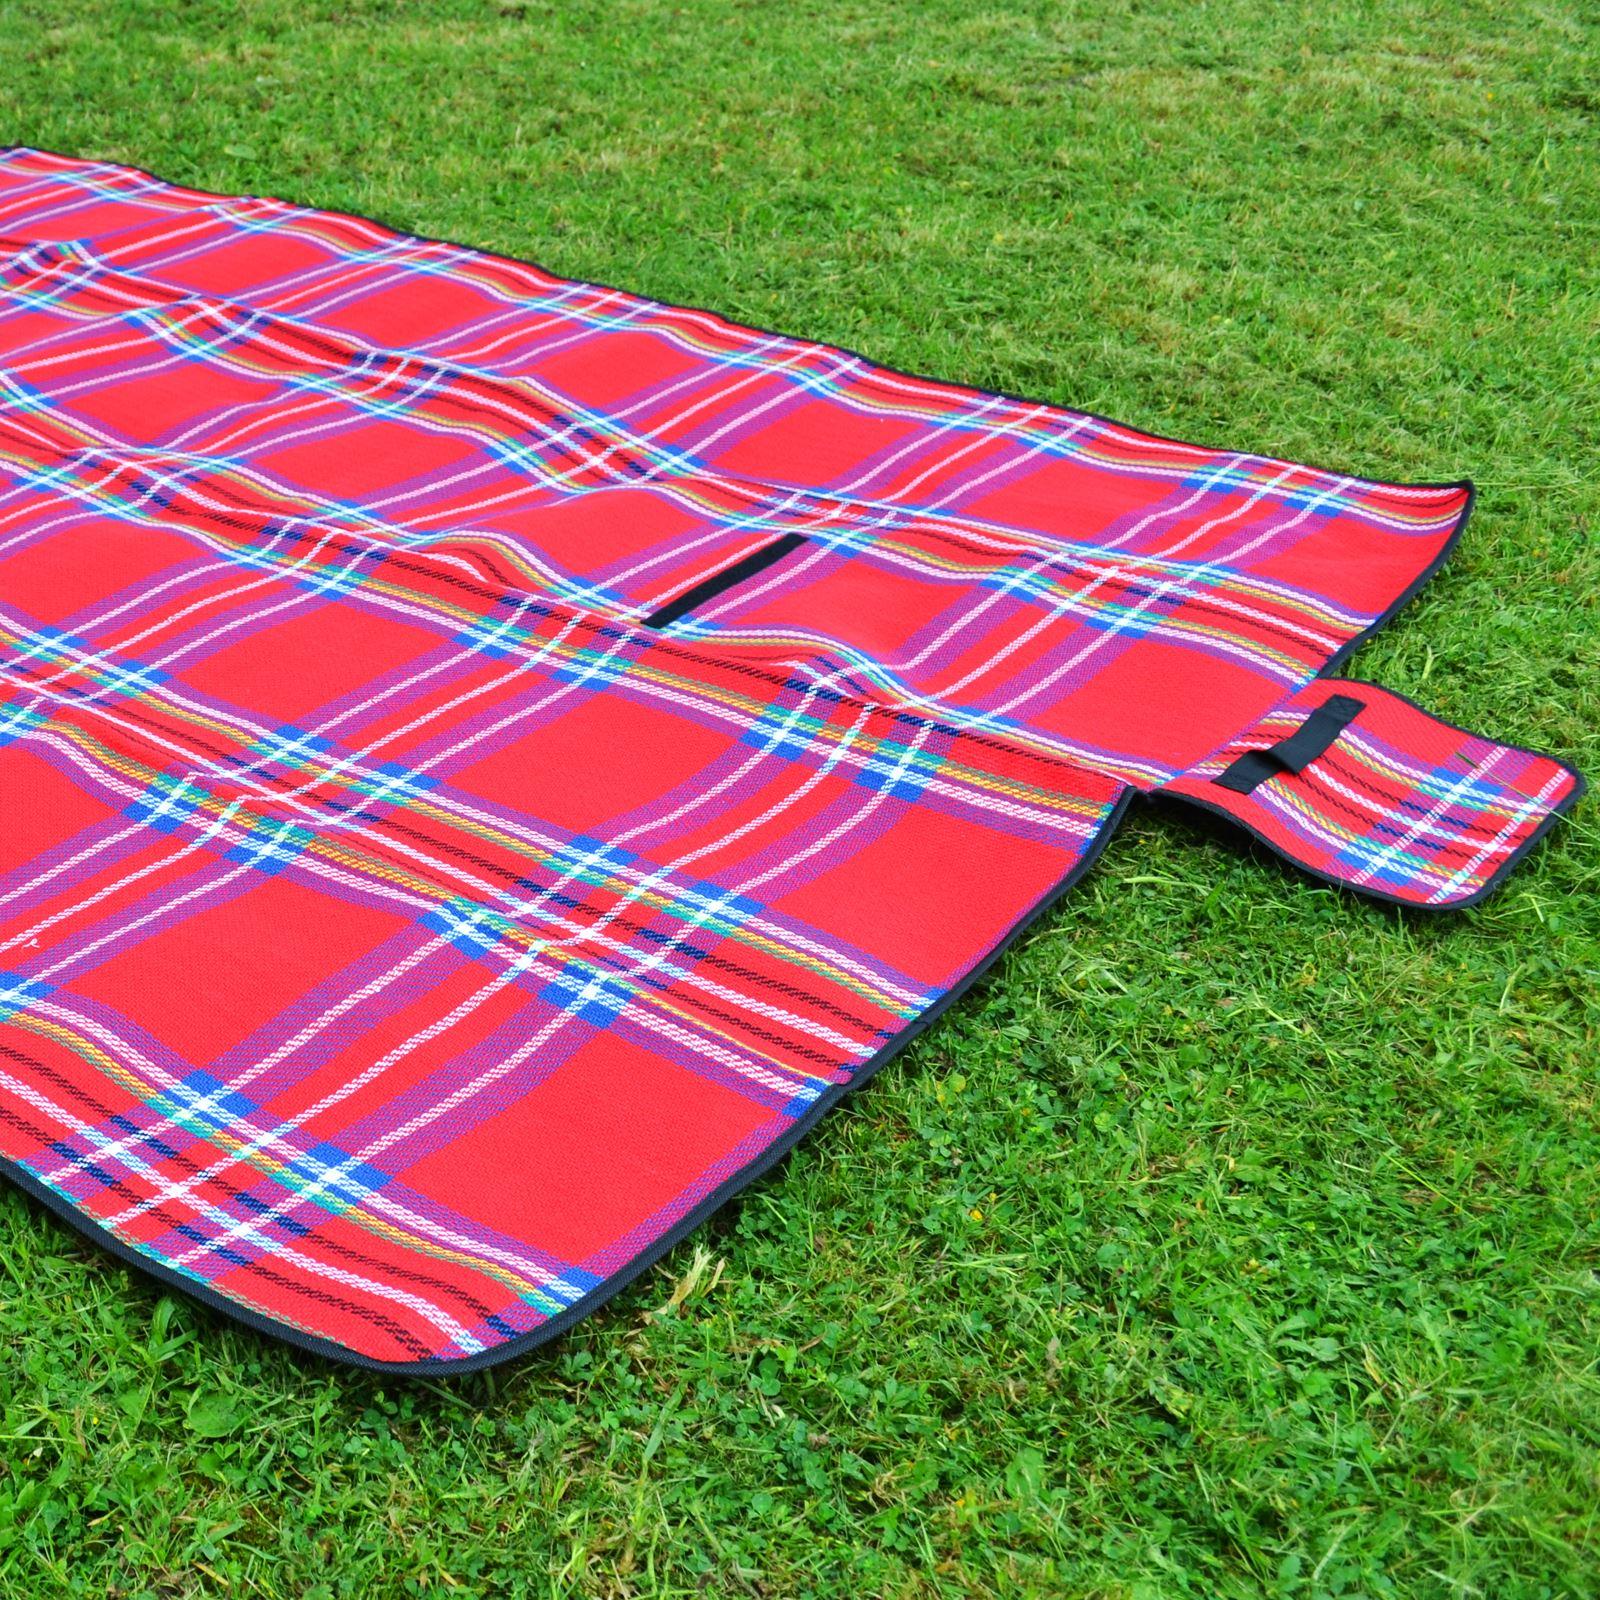 Large Waterproof Portable Picnic Blanket Mat Camping Beach Festival PVC 1.5 x 2M